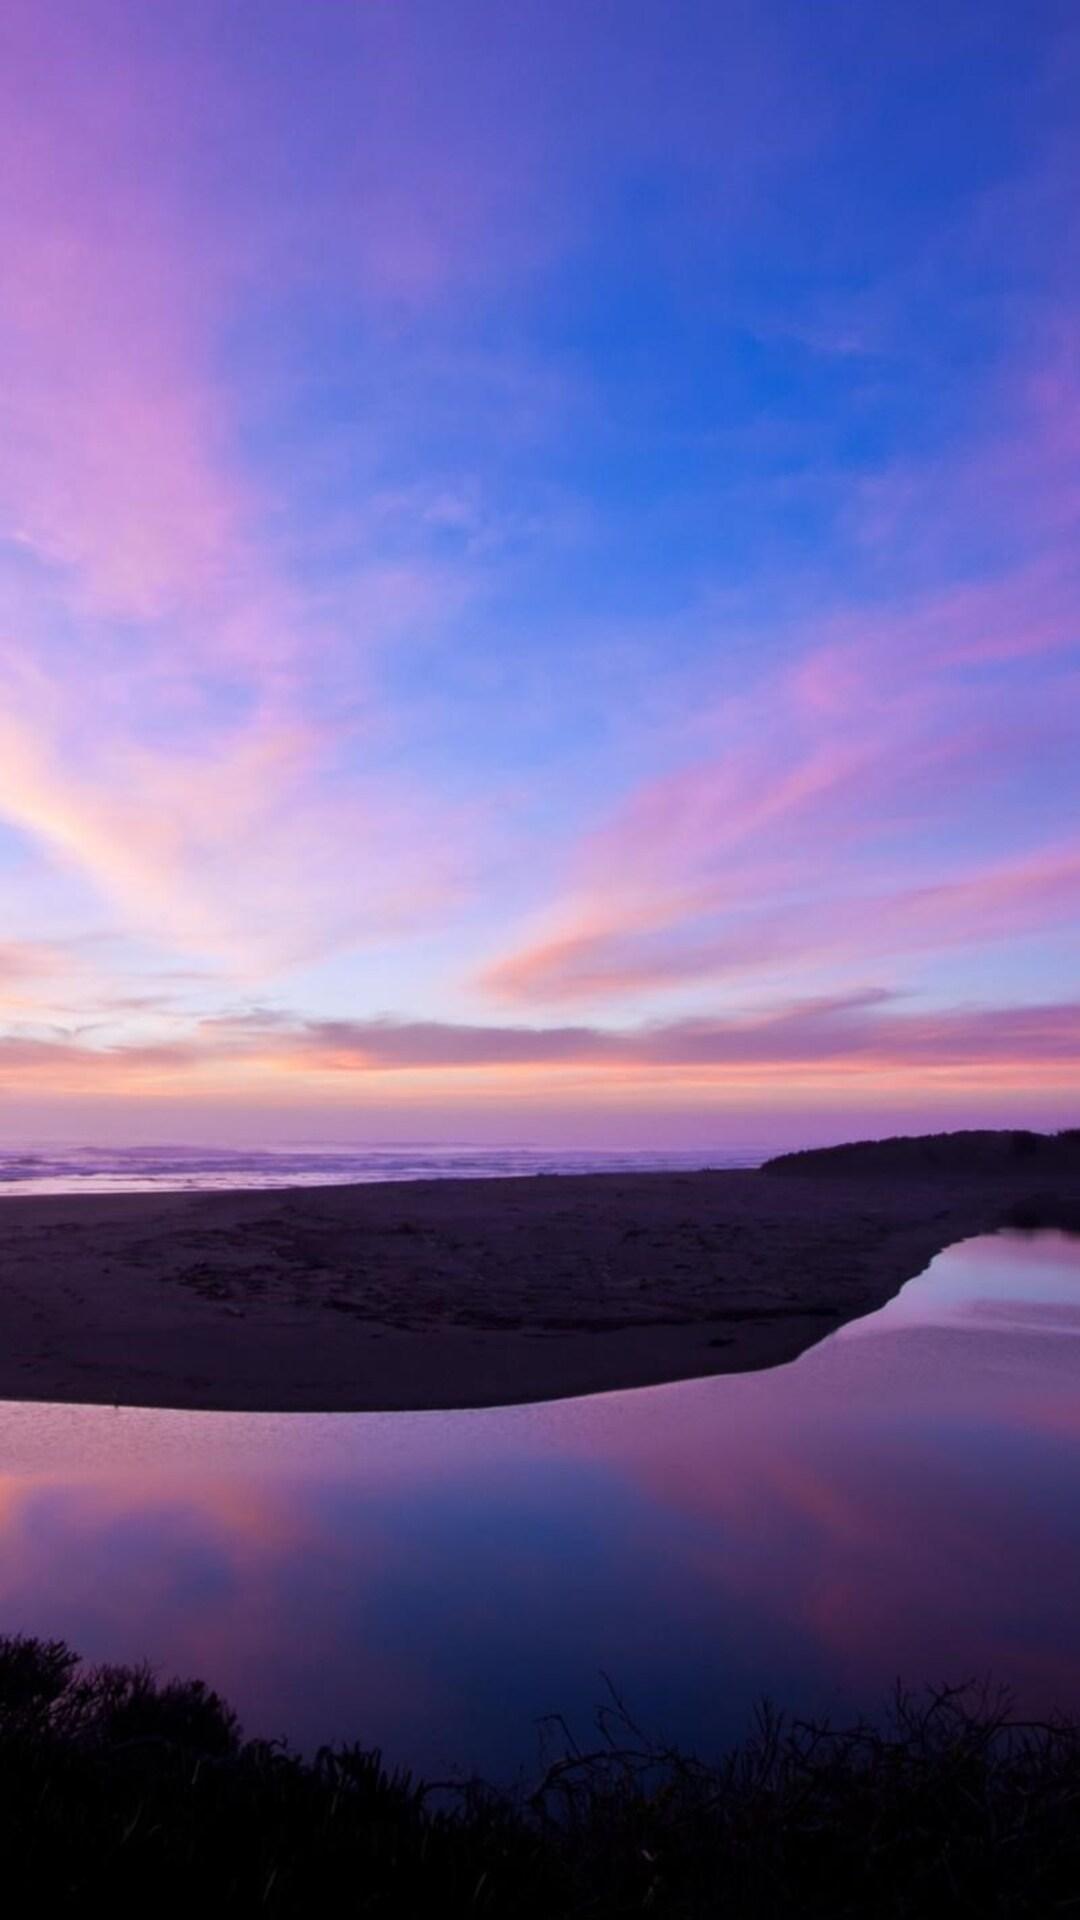 north-salmon-creek-beach-reflection.jpg